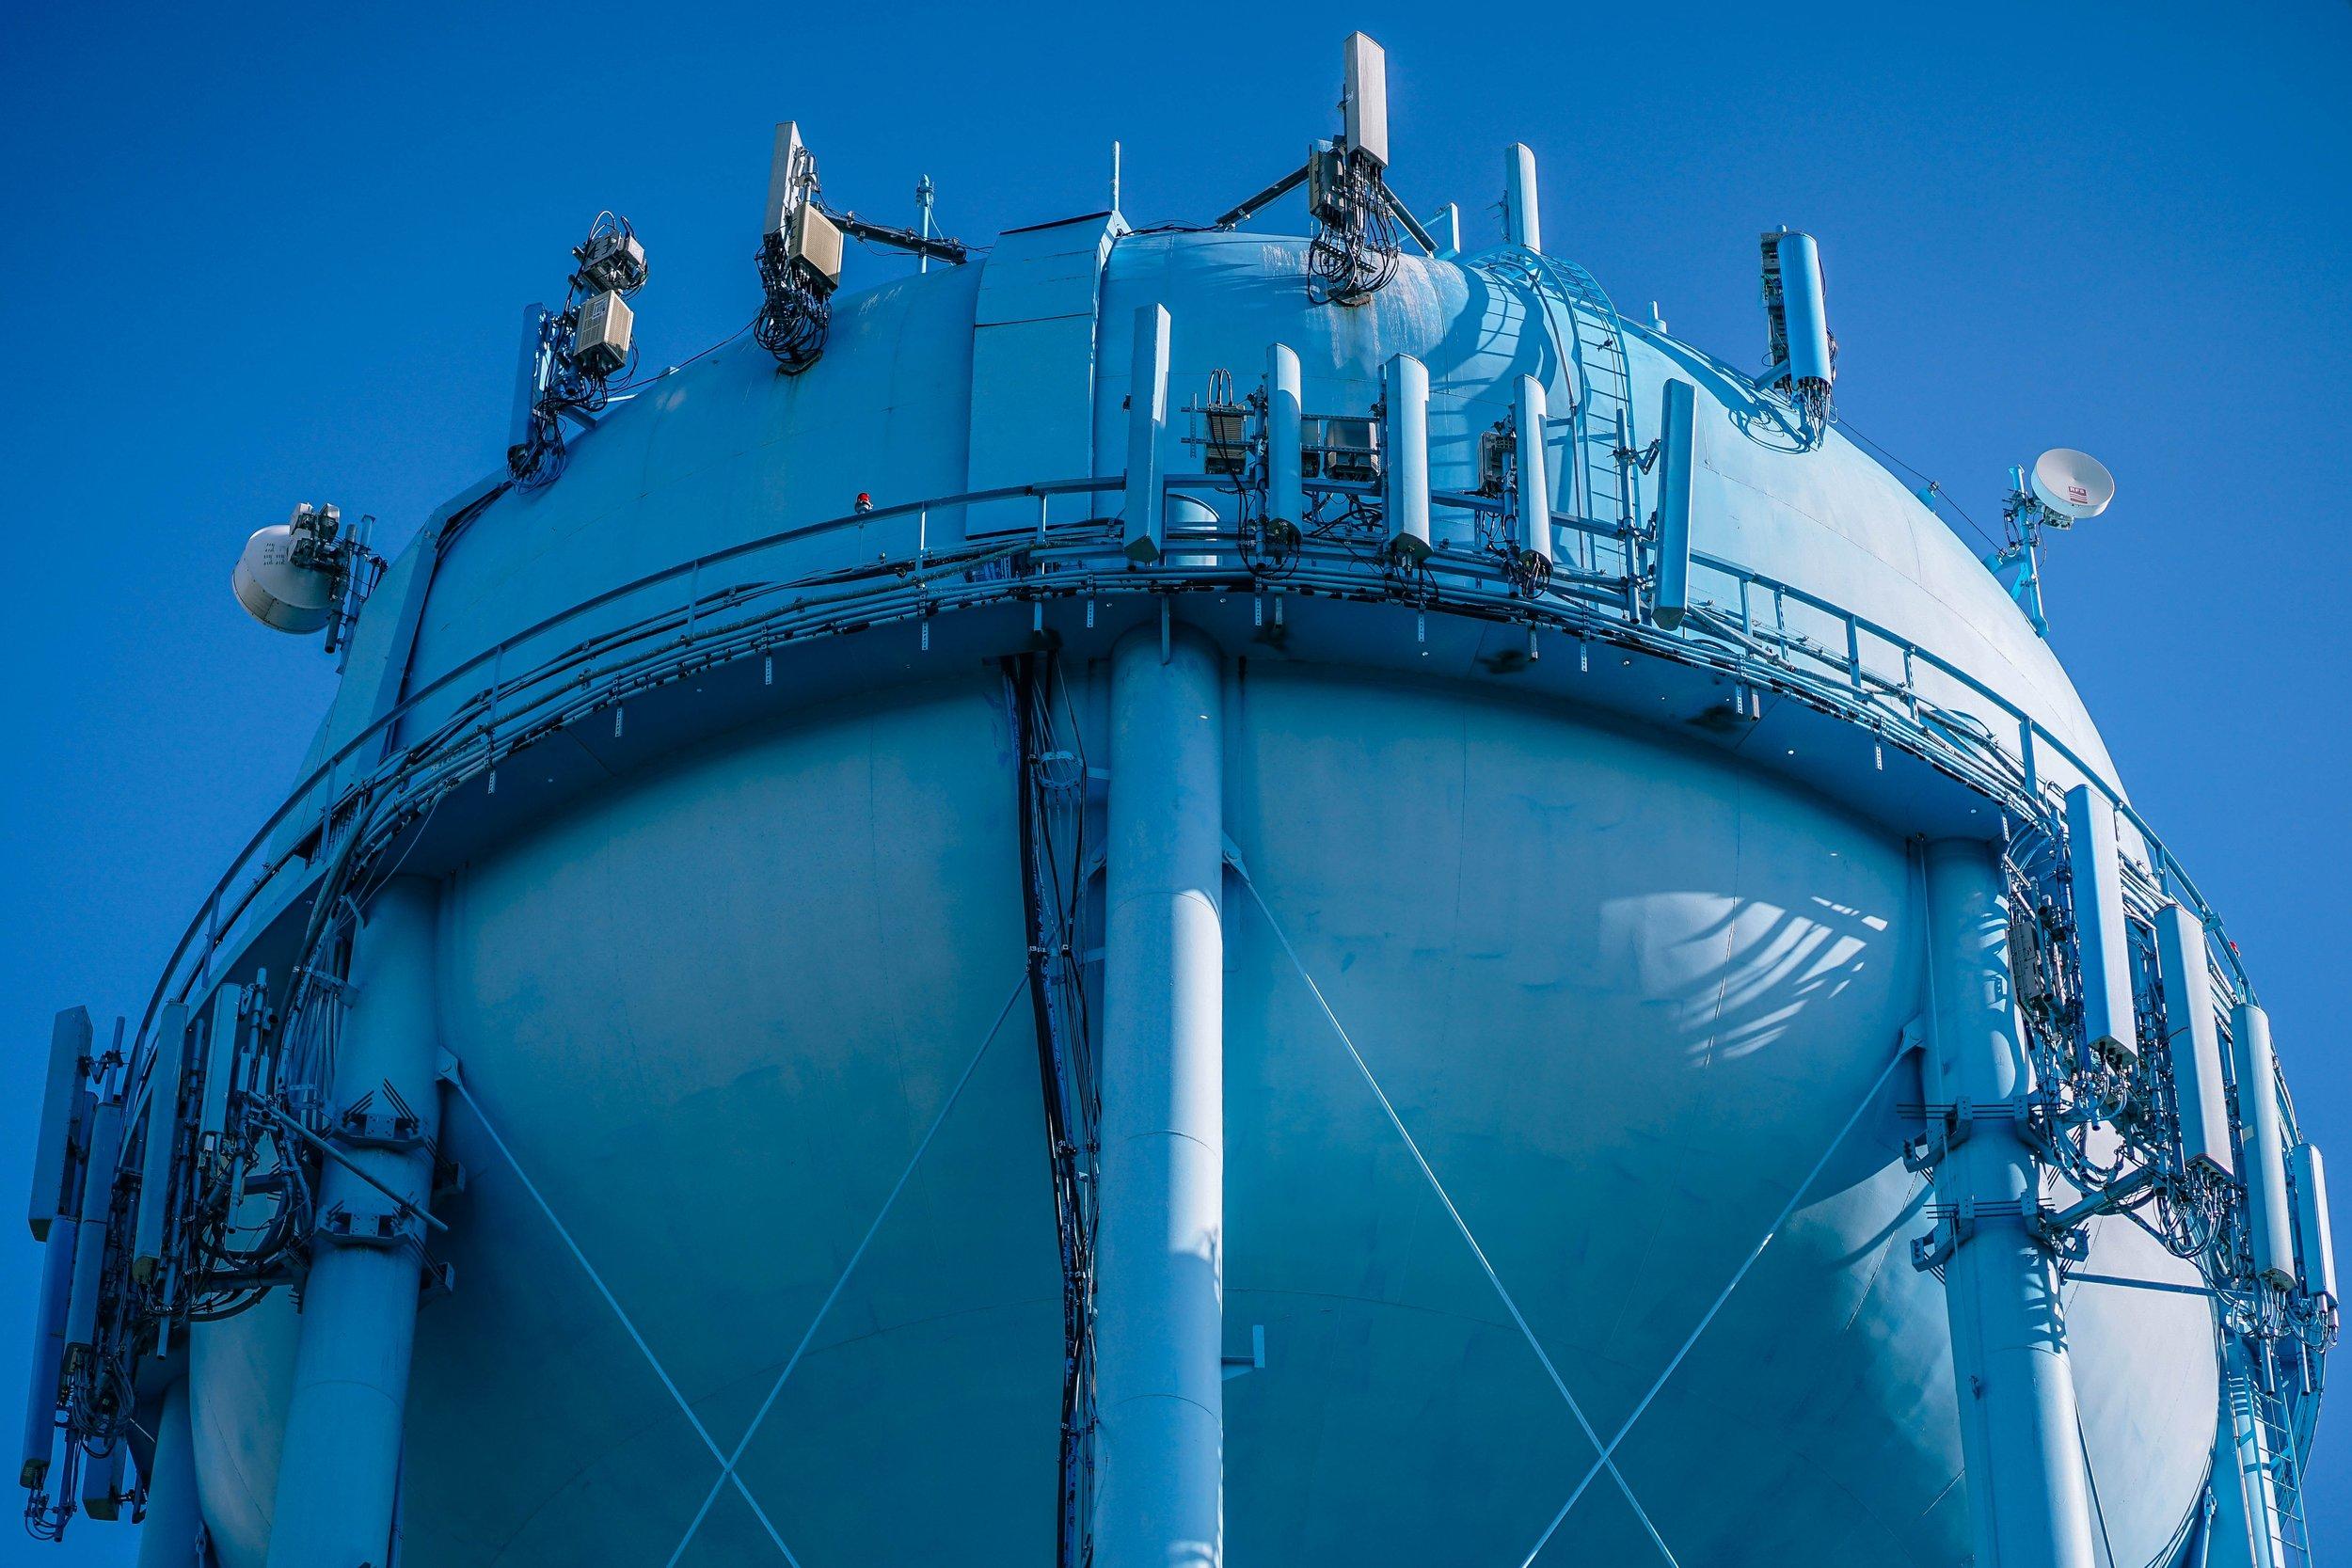 blue water tower stock photo - unsplash.jpg